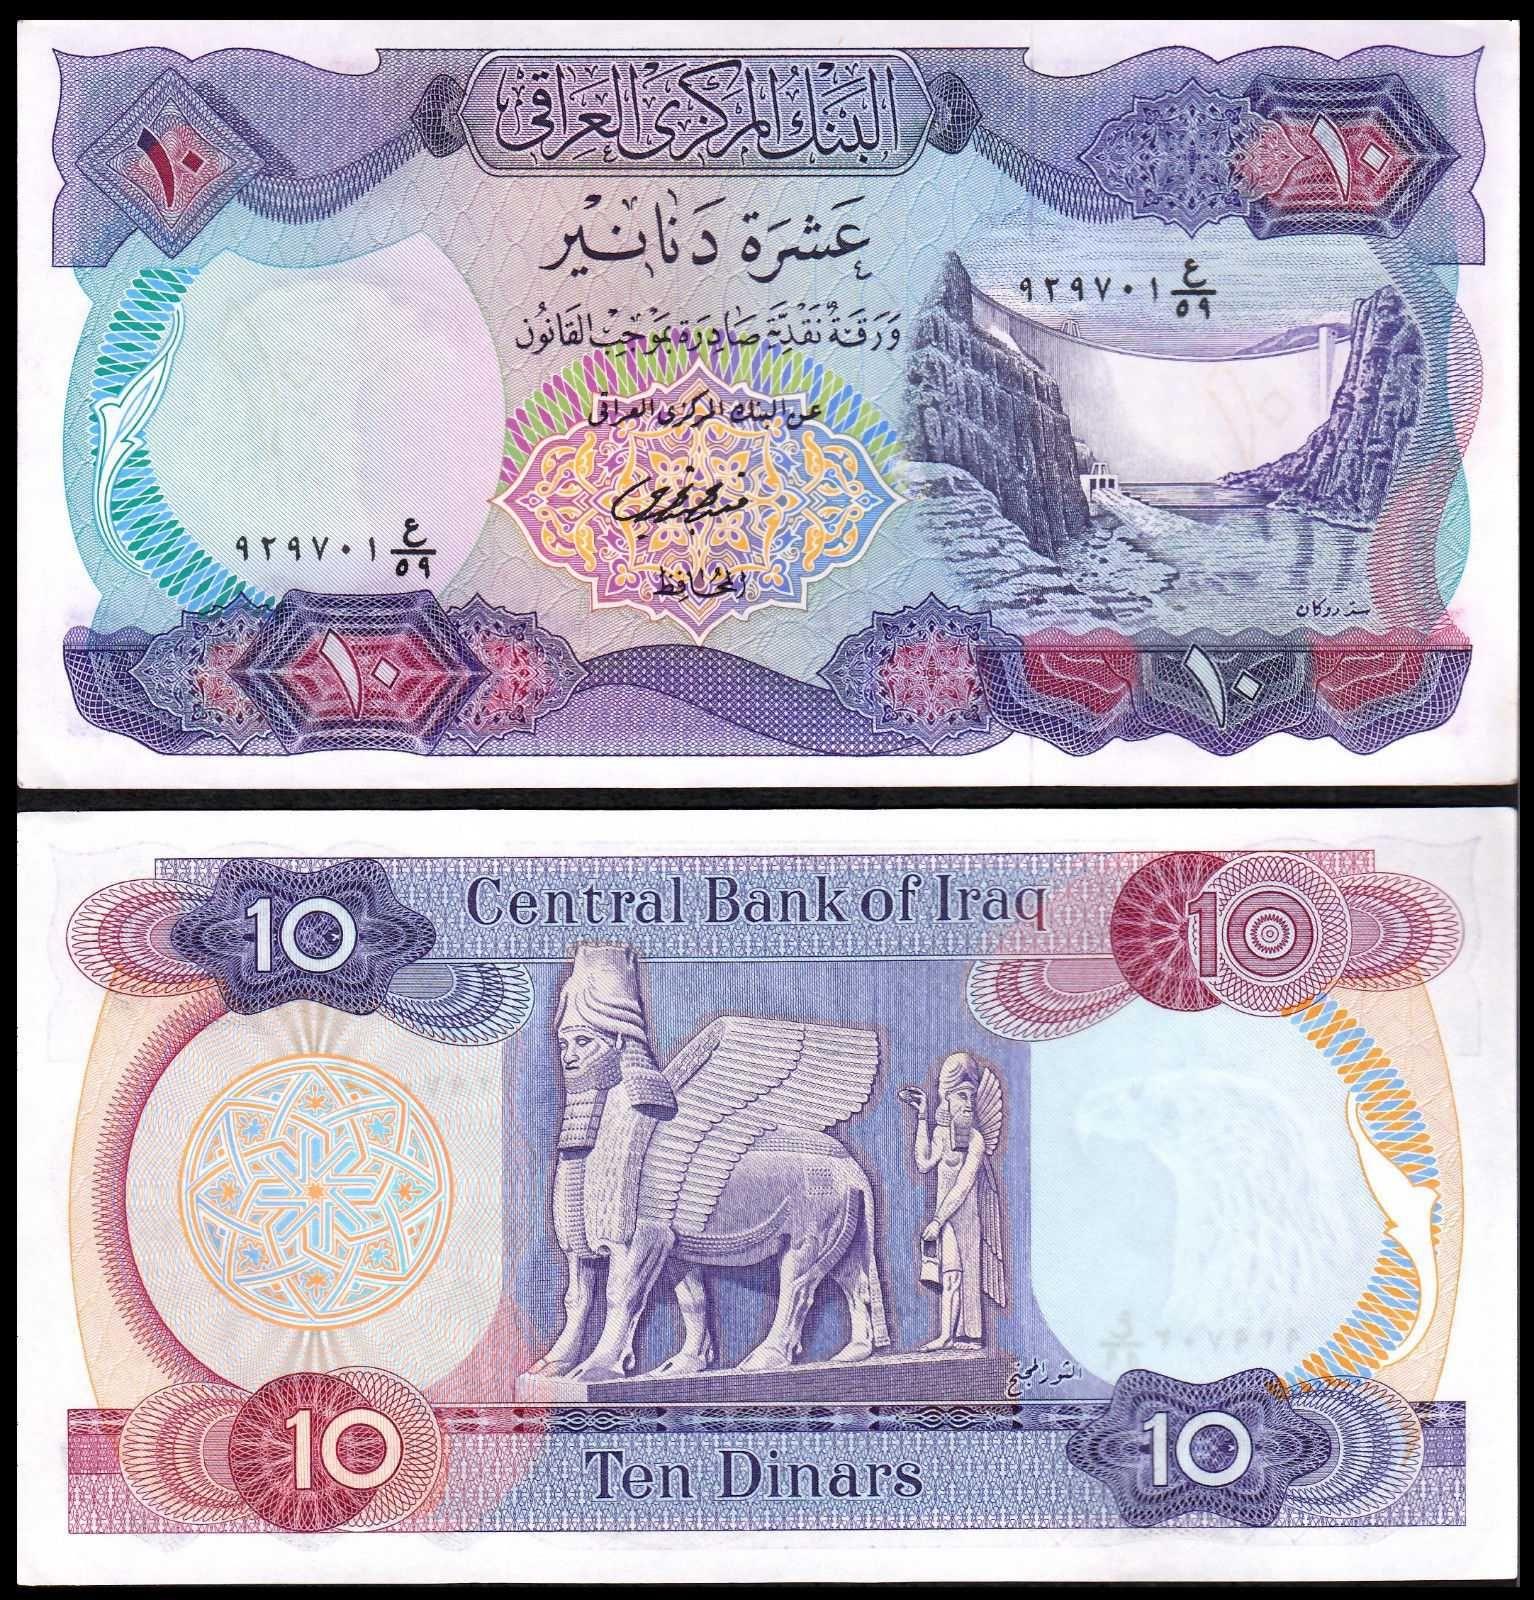 Iraq 10 Dinars 1973 65b With Images